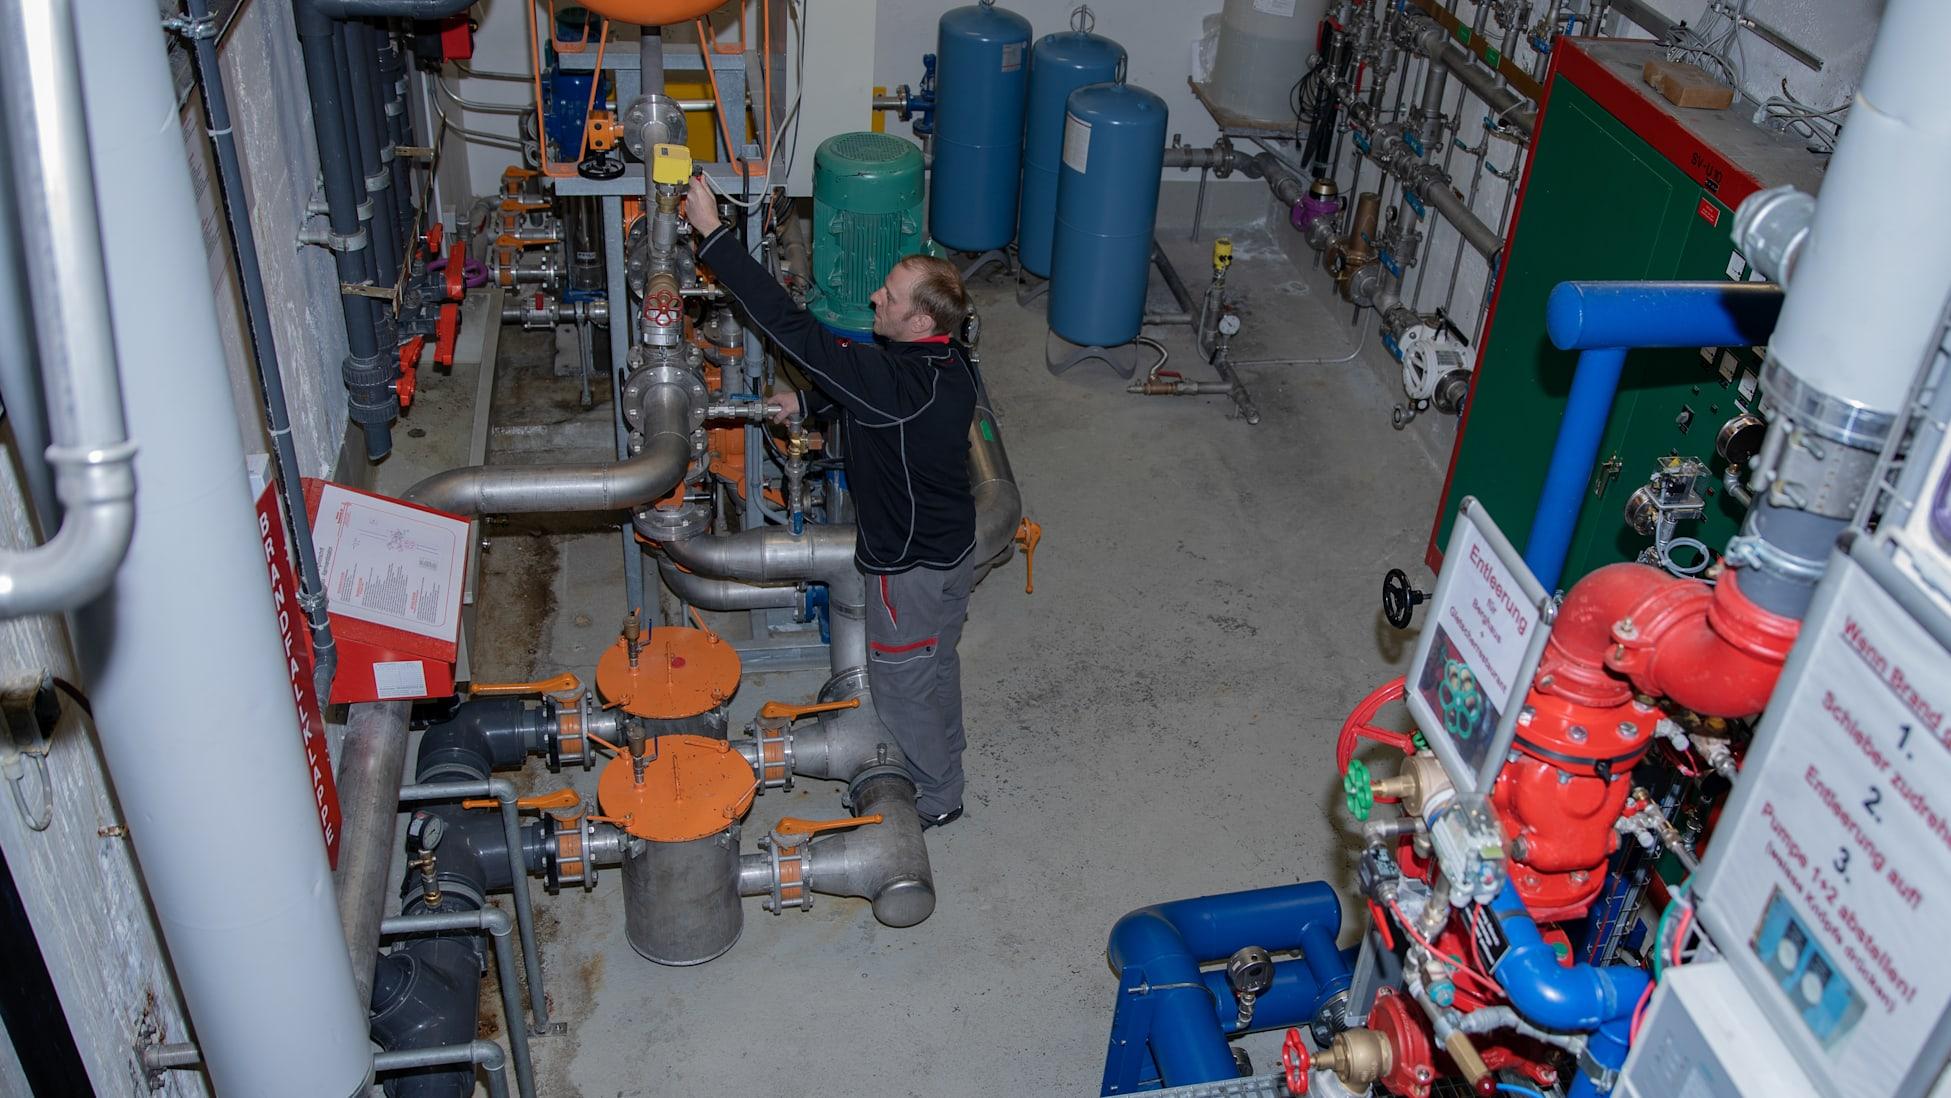 Sanitaer Jungfraubahnen Andreas Kipfer 1